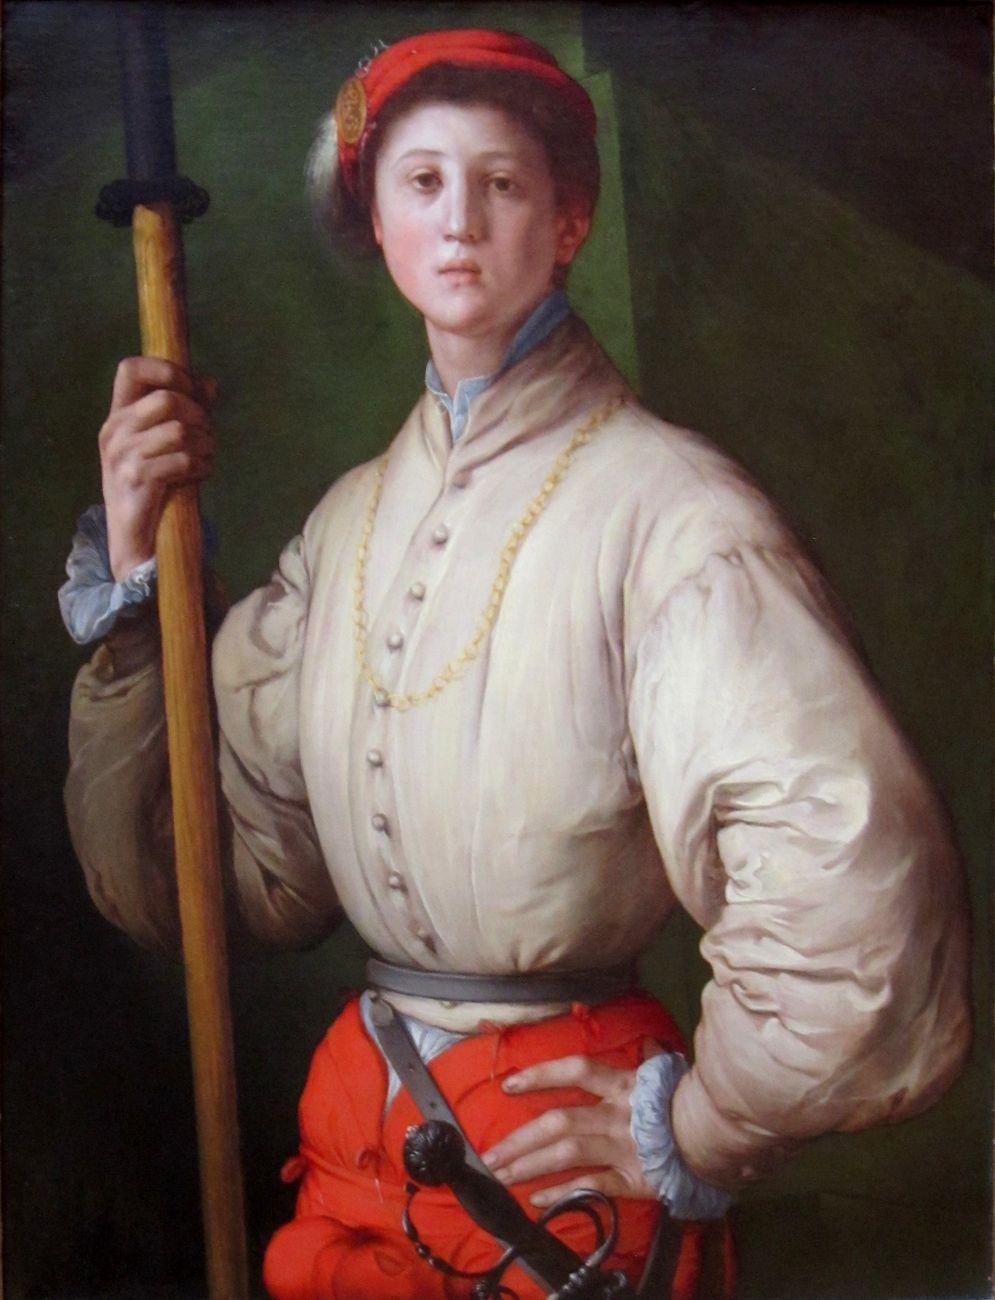 Jacopo Pontormo, Alabardiere, 1529-30 o 1537. Getty Museum, Los Angeles